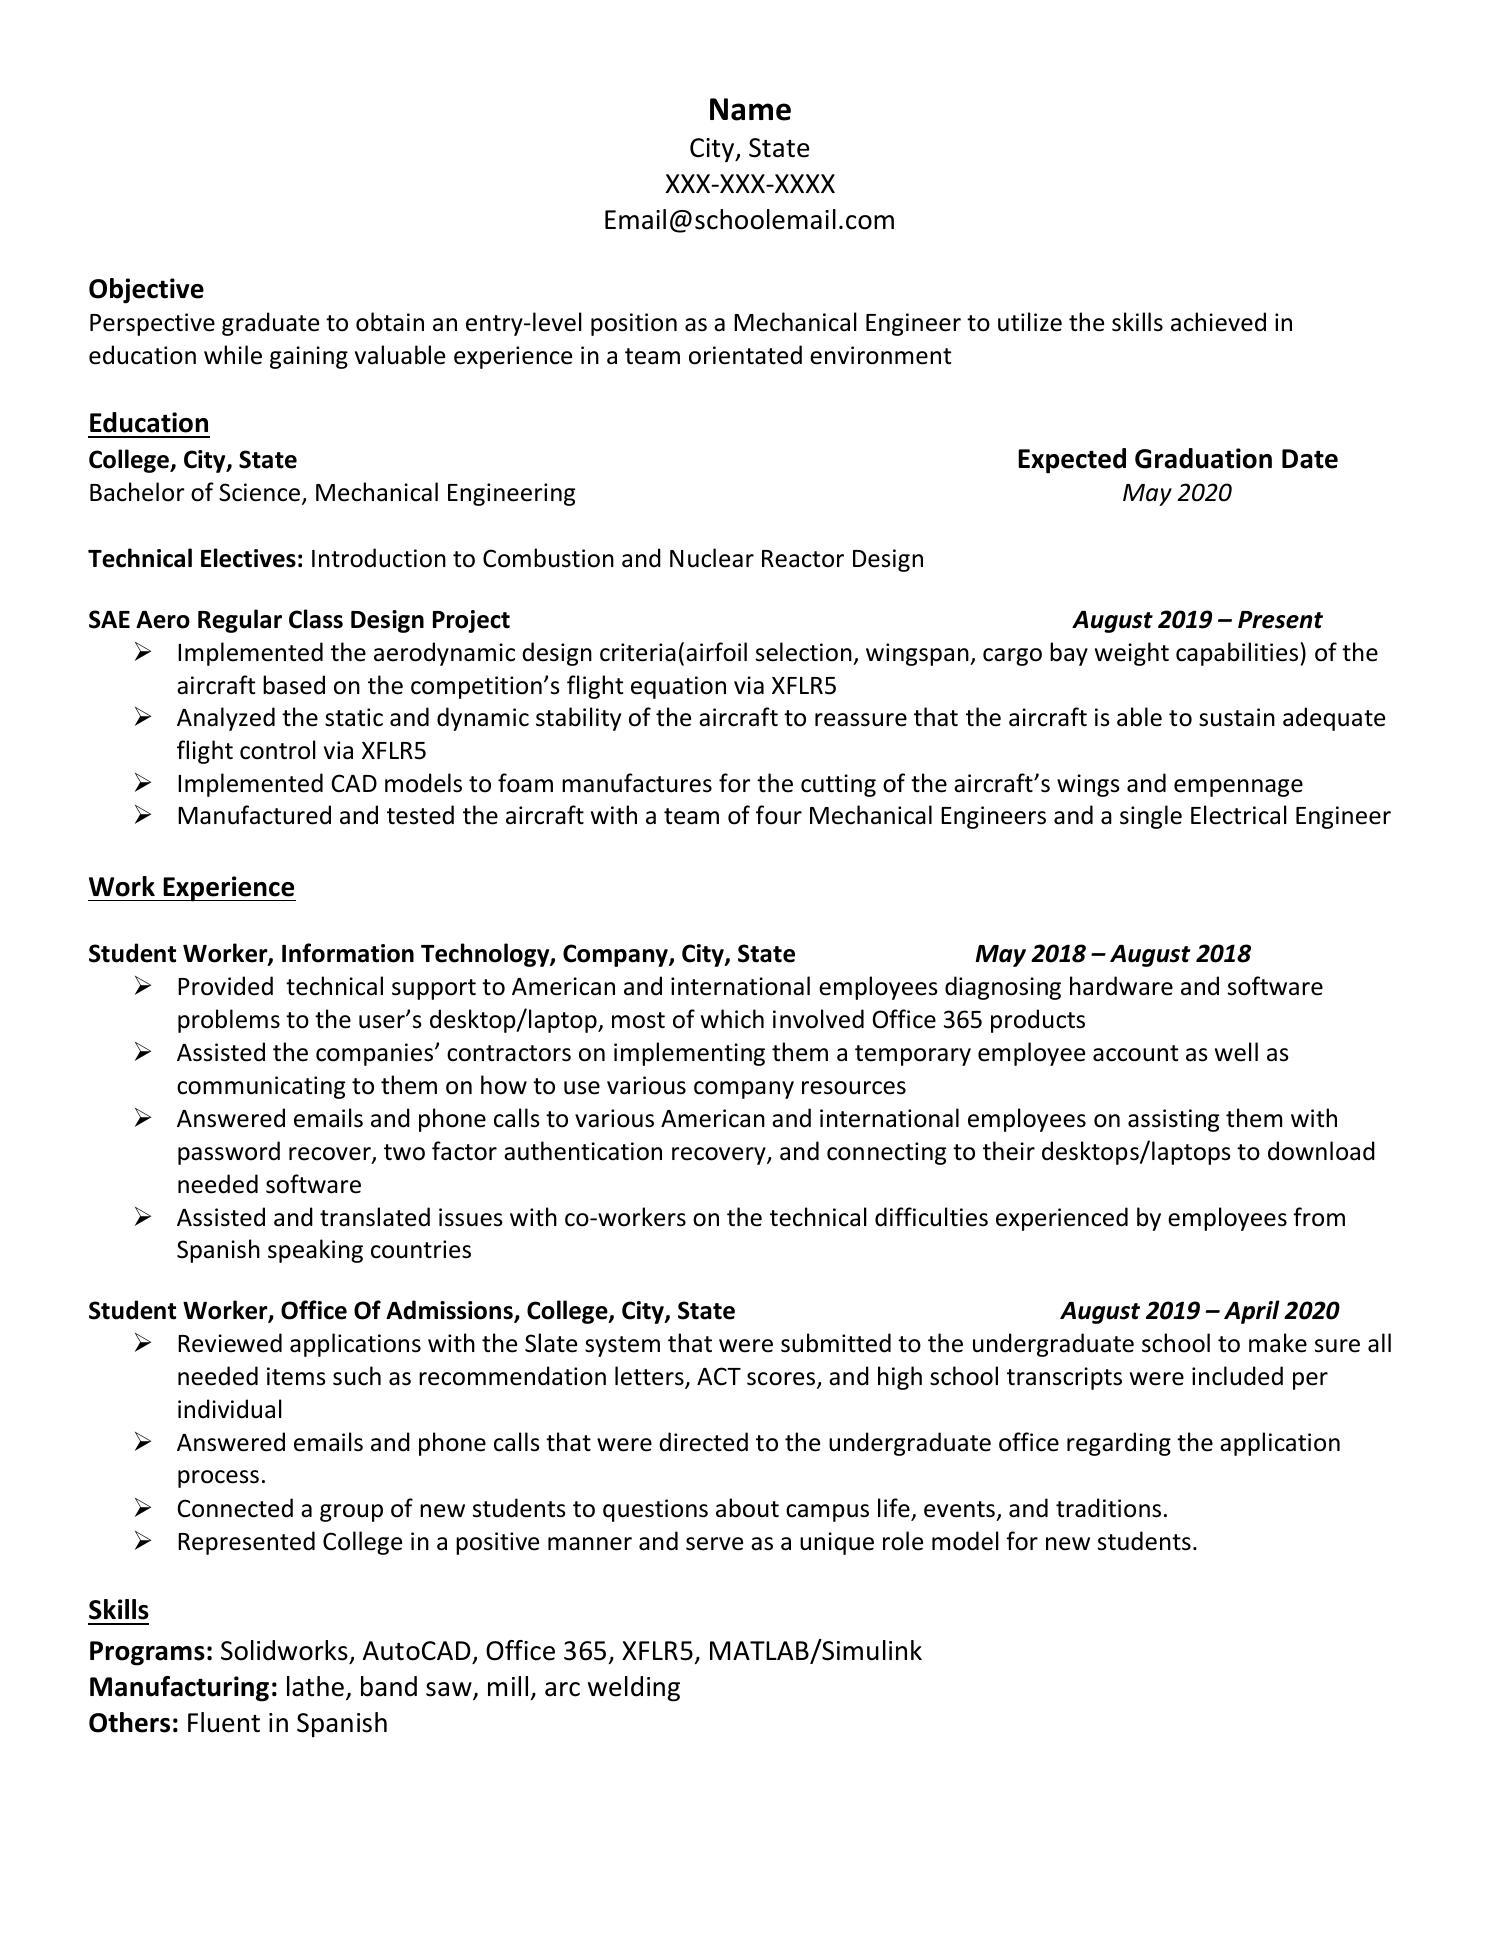 Spring2020 Resume Reddit Pdf Docdroid